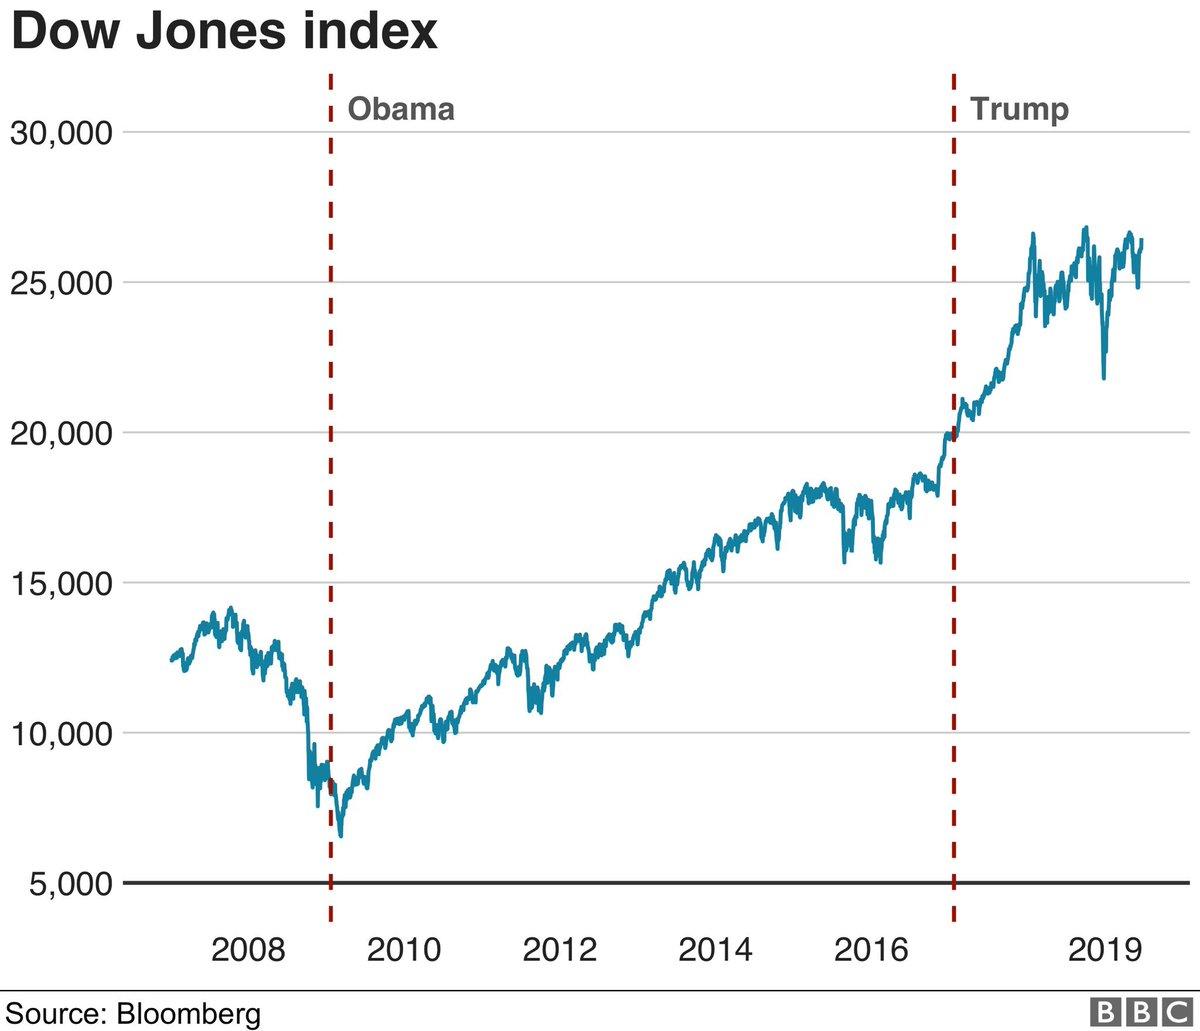 @realDonaldTrump Thank Obama, you inherited a great economy